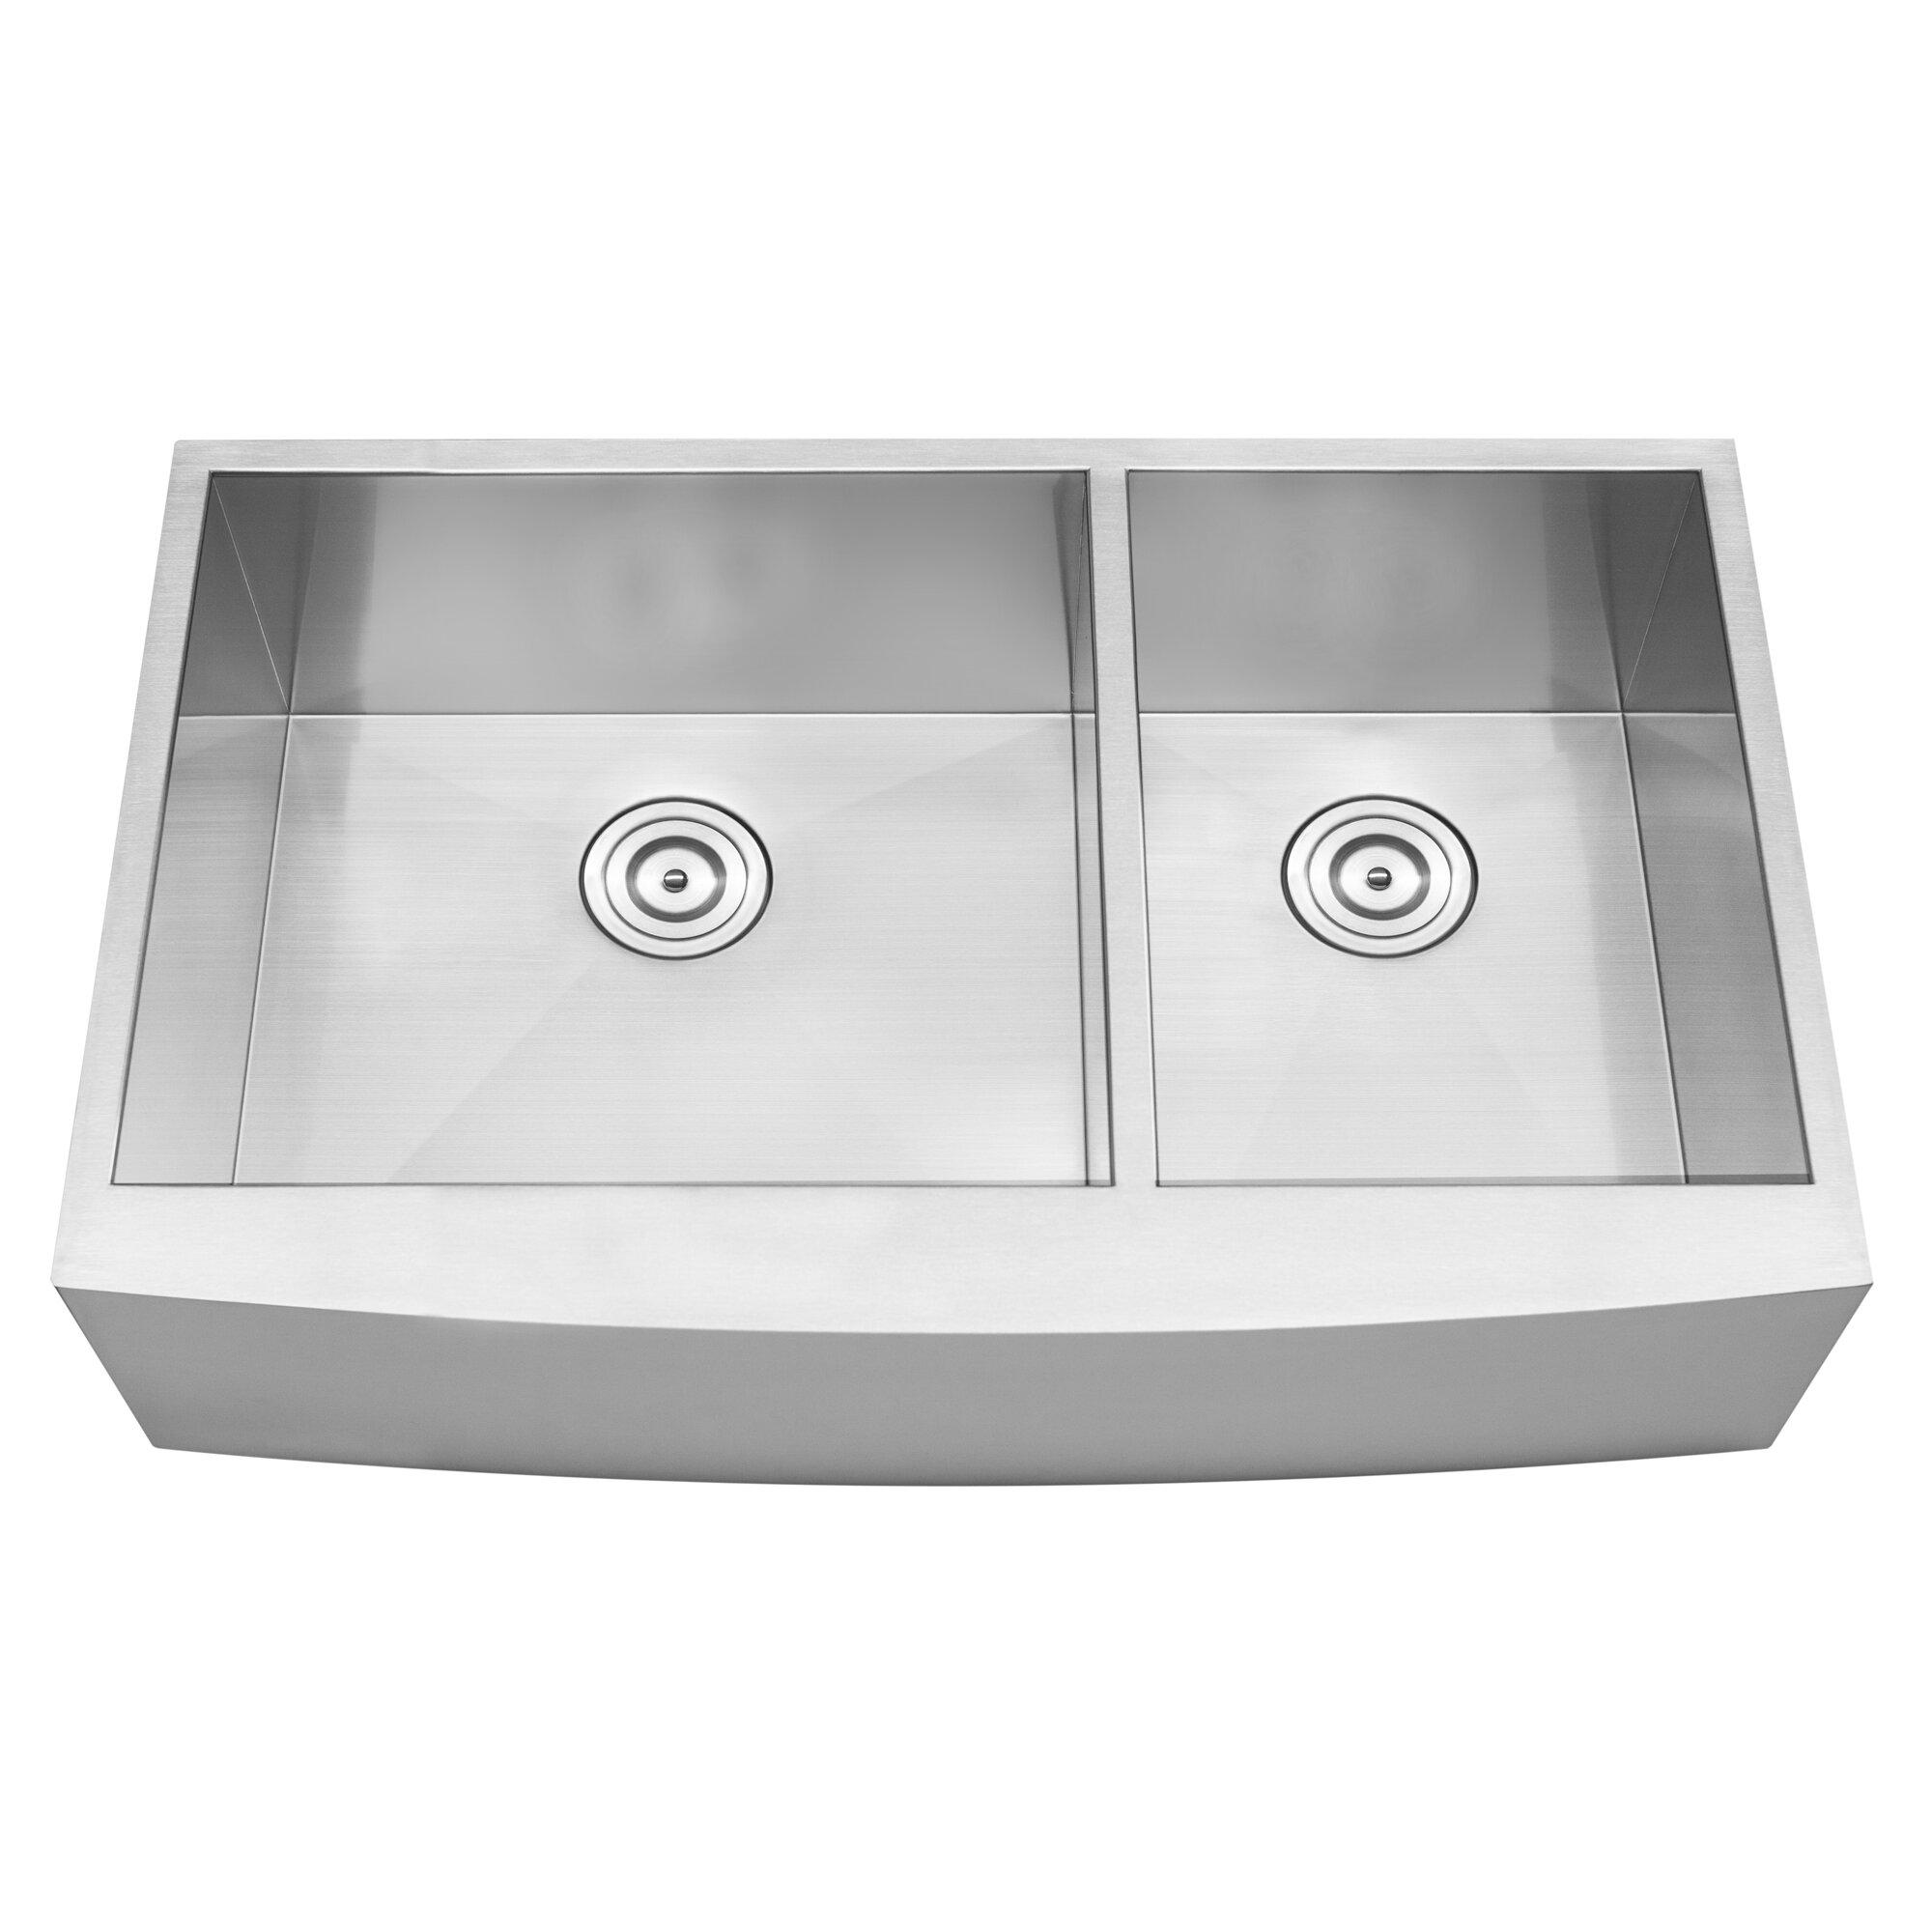 Ticor Sinks Bryce Series 36\